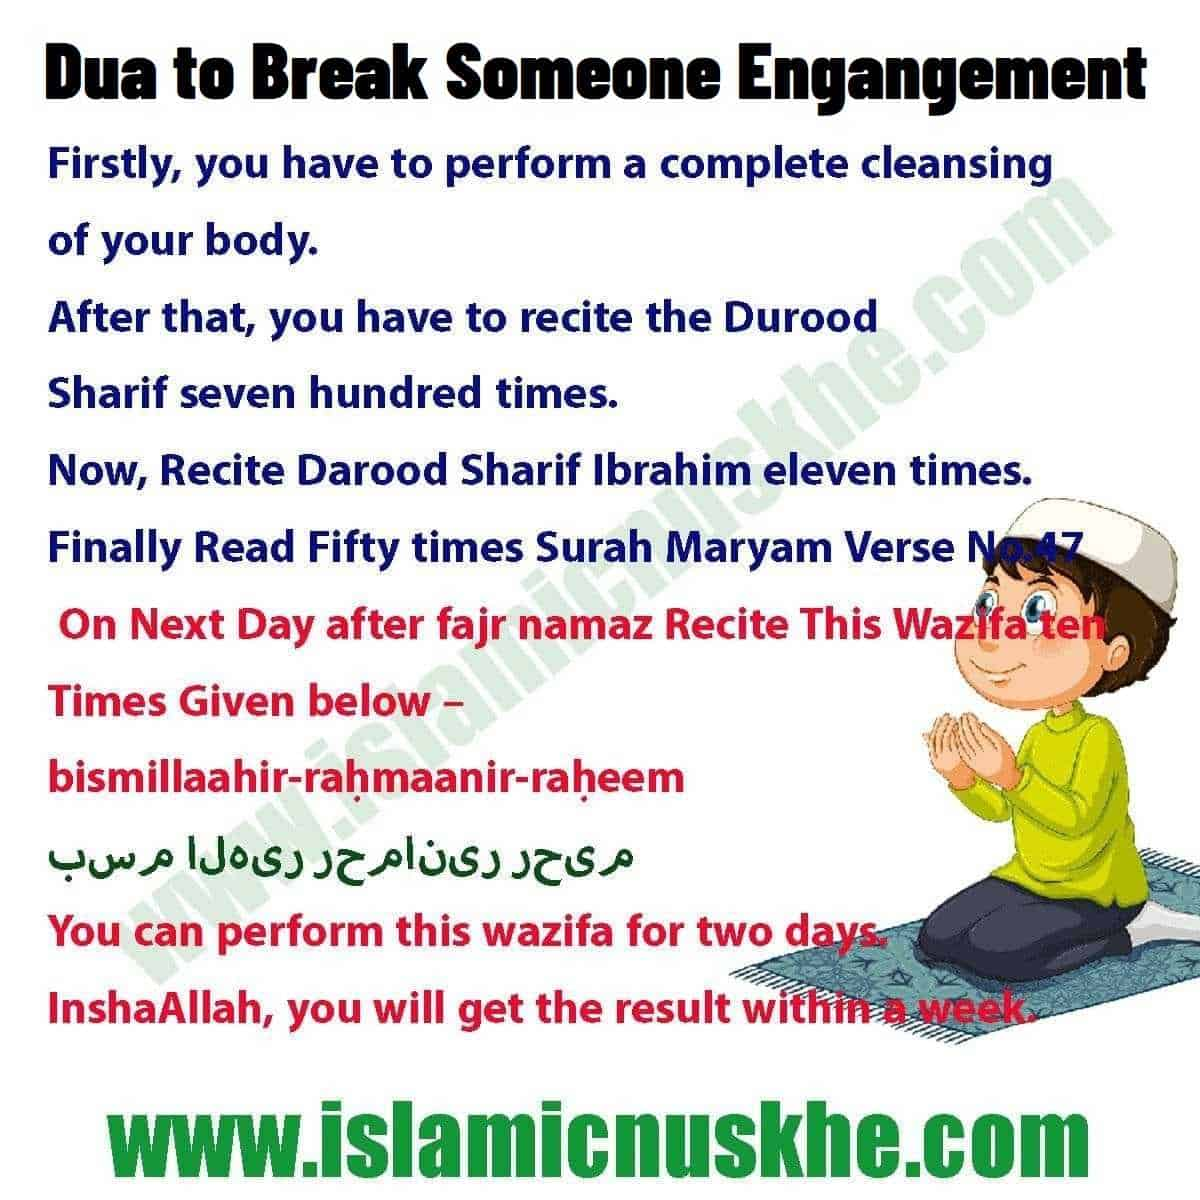 Wazifa to Break Somone Marriage